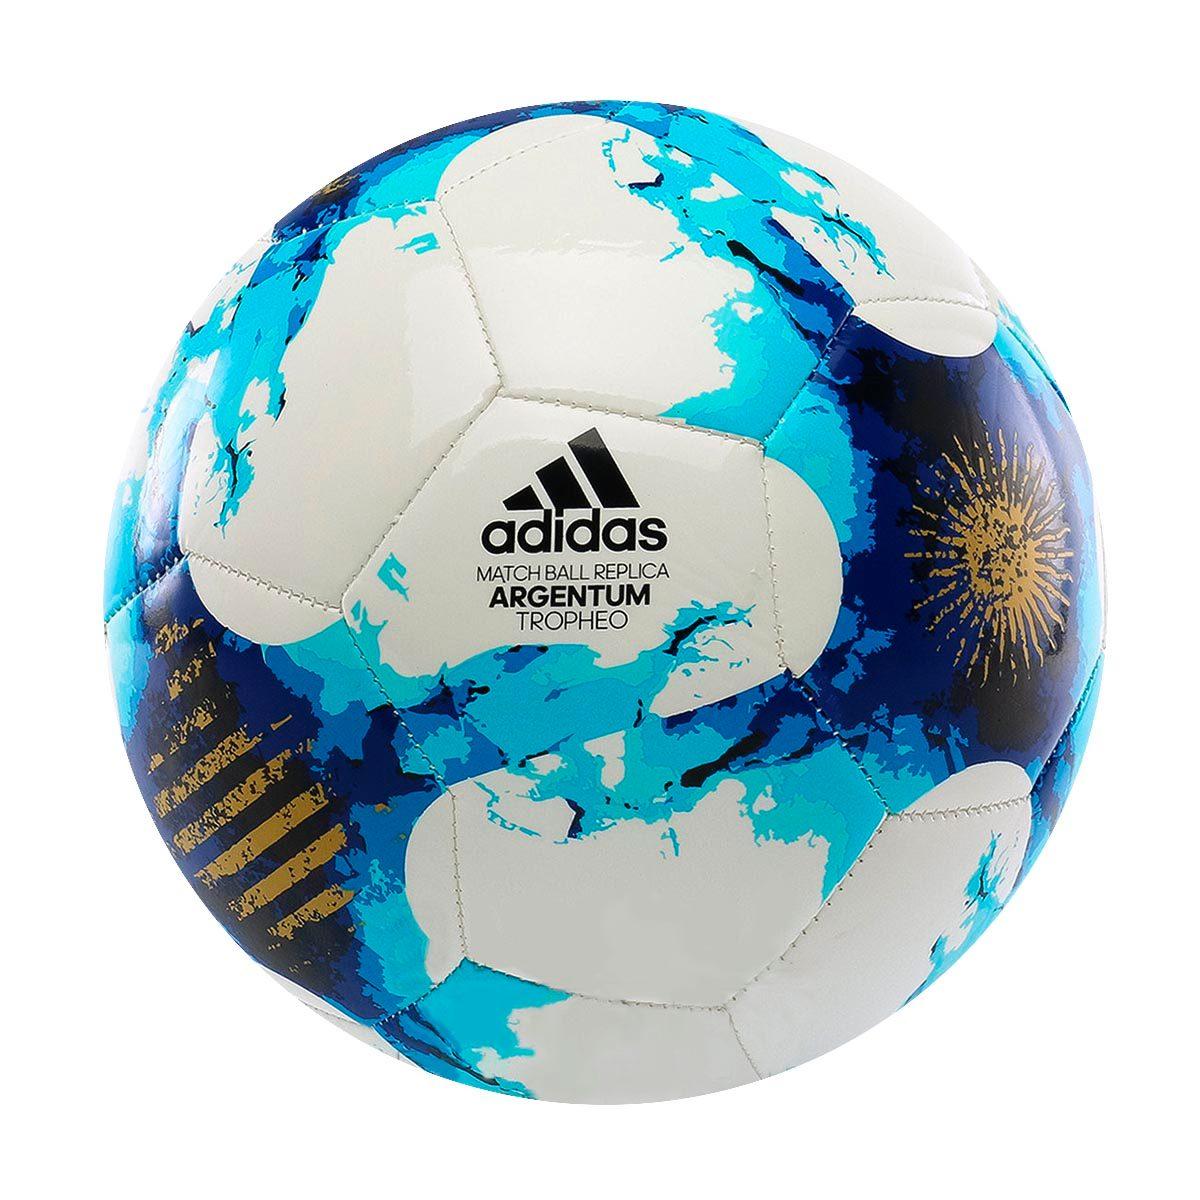 pelota de fútbol adidas afa 17 tropheo. Cargando zoom. c6ffabc968413